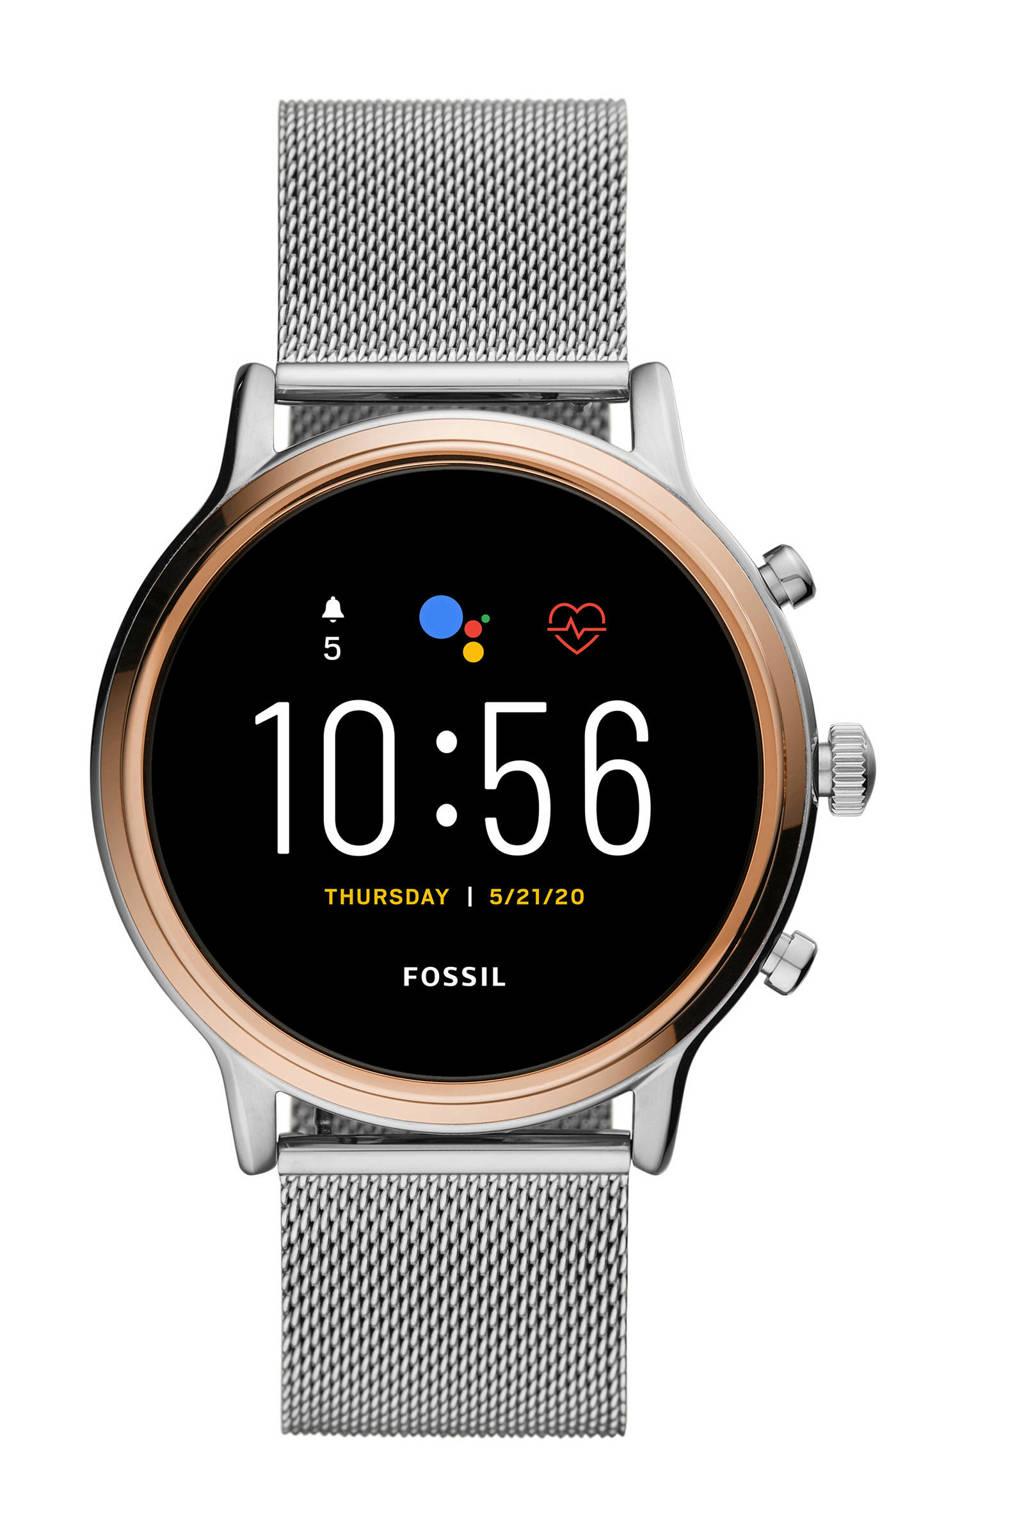 Fossil Julianna Hr Gen 5 Dames Display Smartwatch FTW6061, Zilver